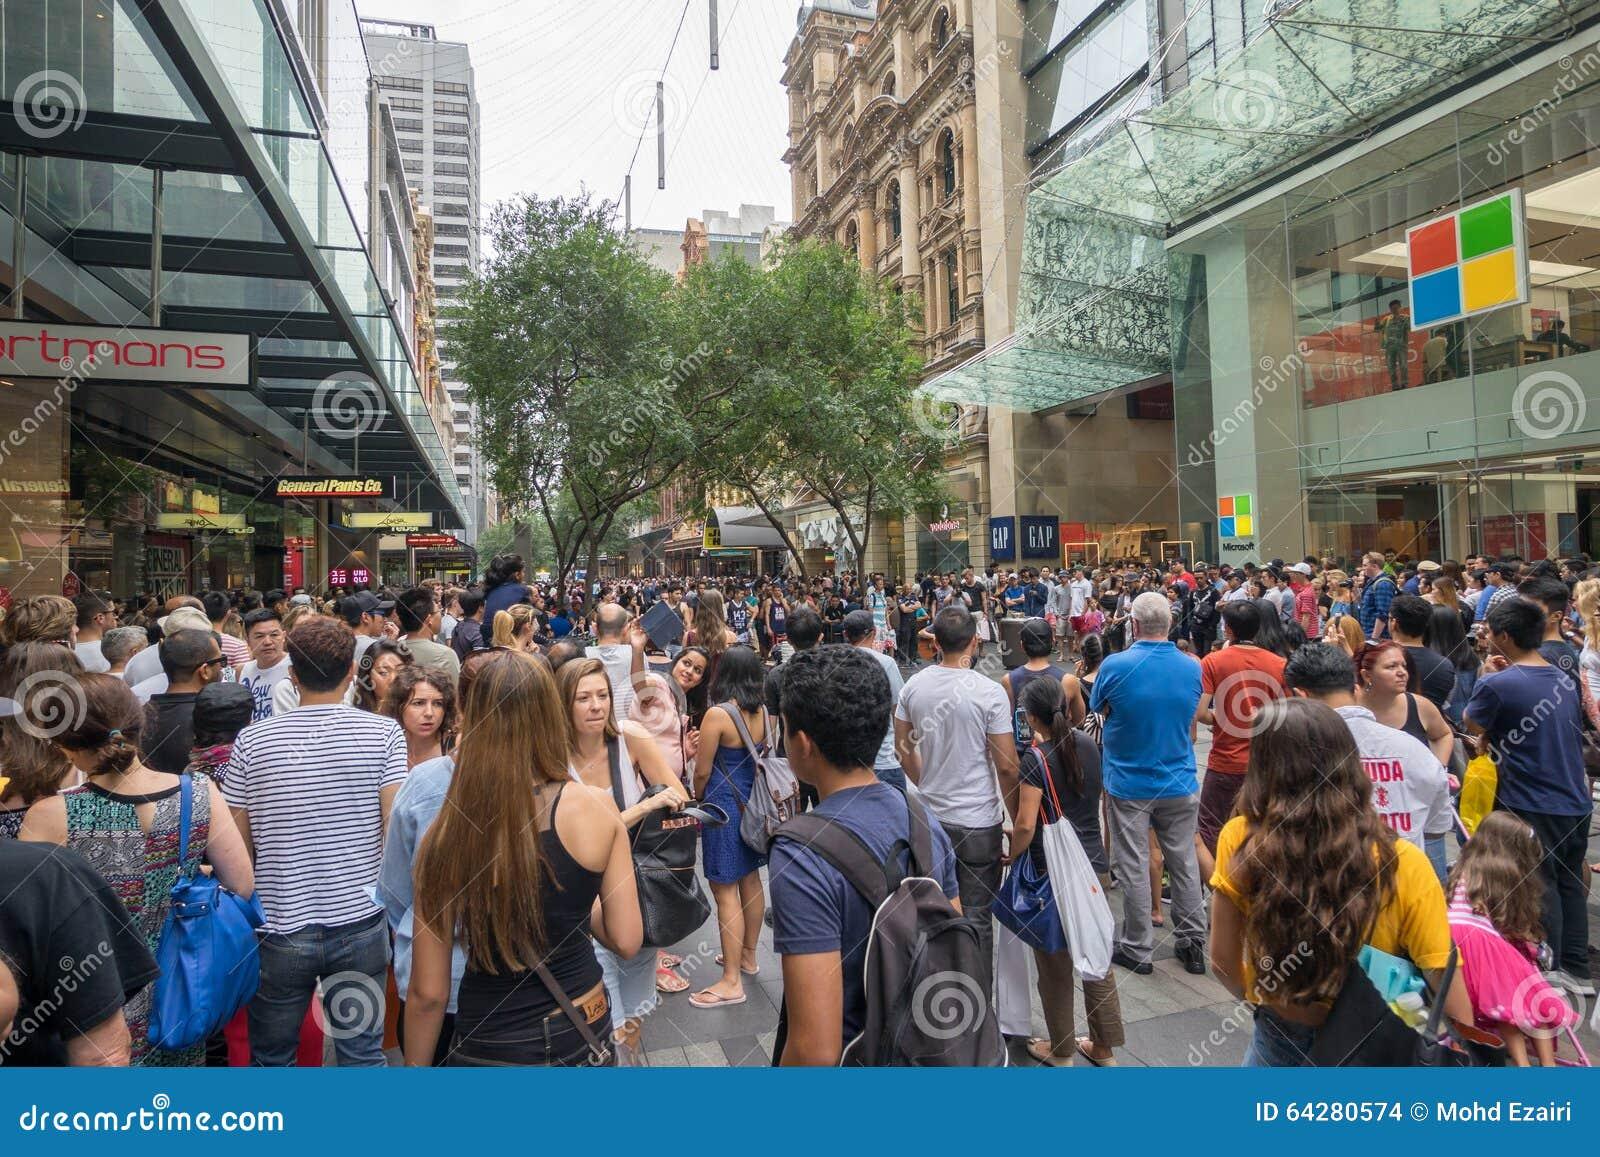 sydney australia december 26 2015 croud of people at the fa